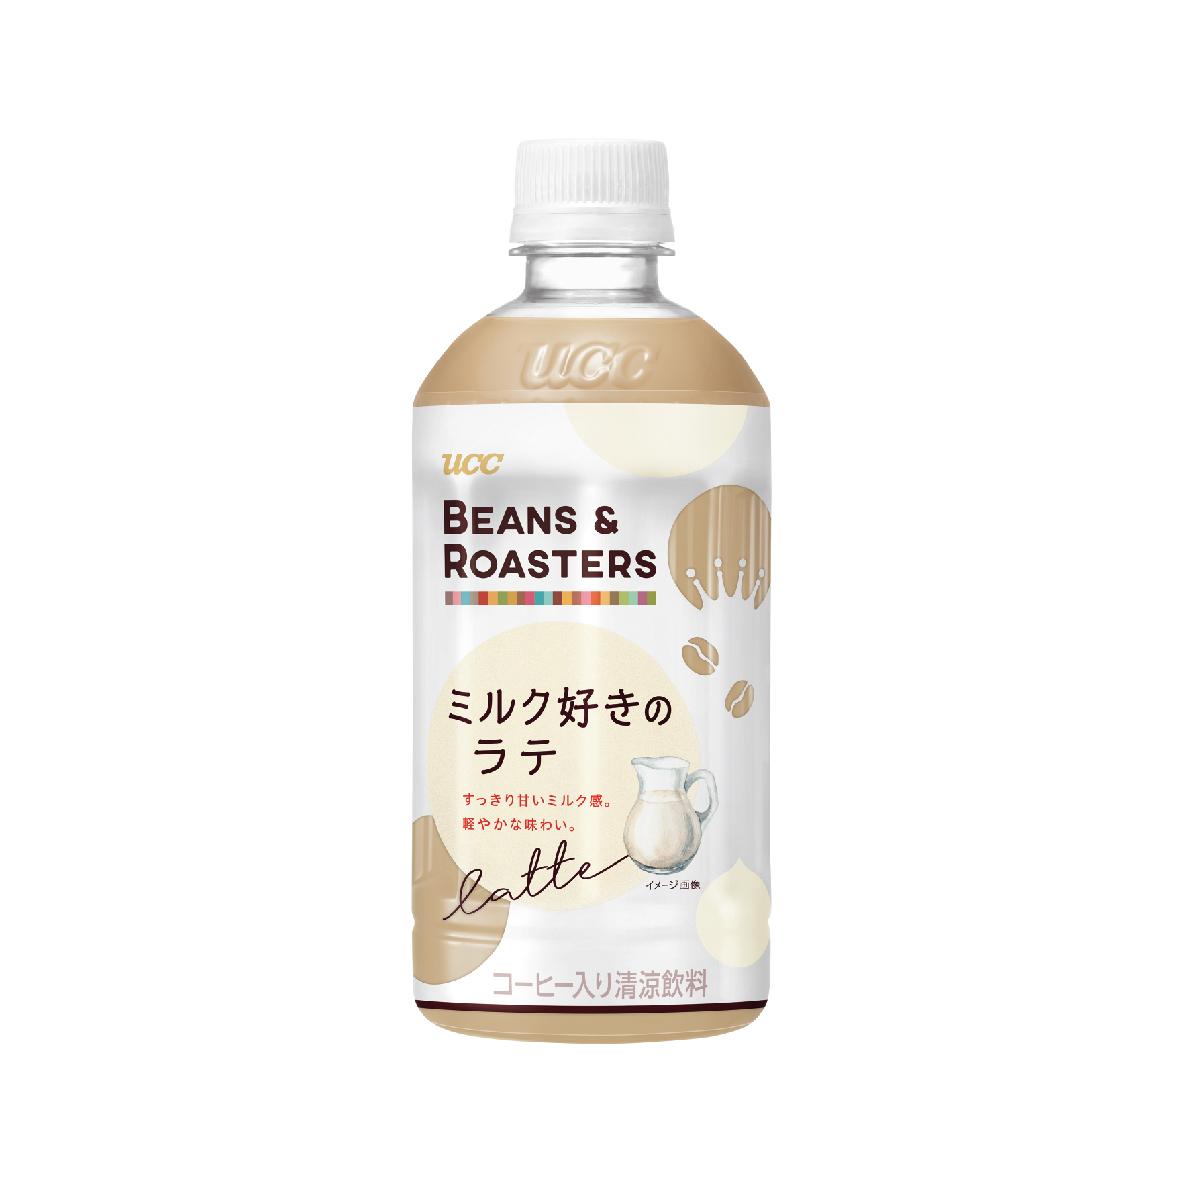 UCC Beans & Roasters Milk Latte PET